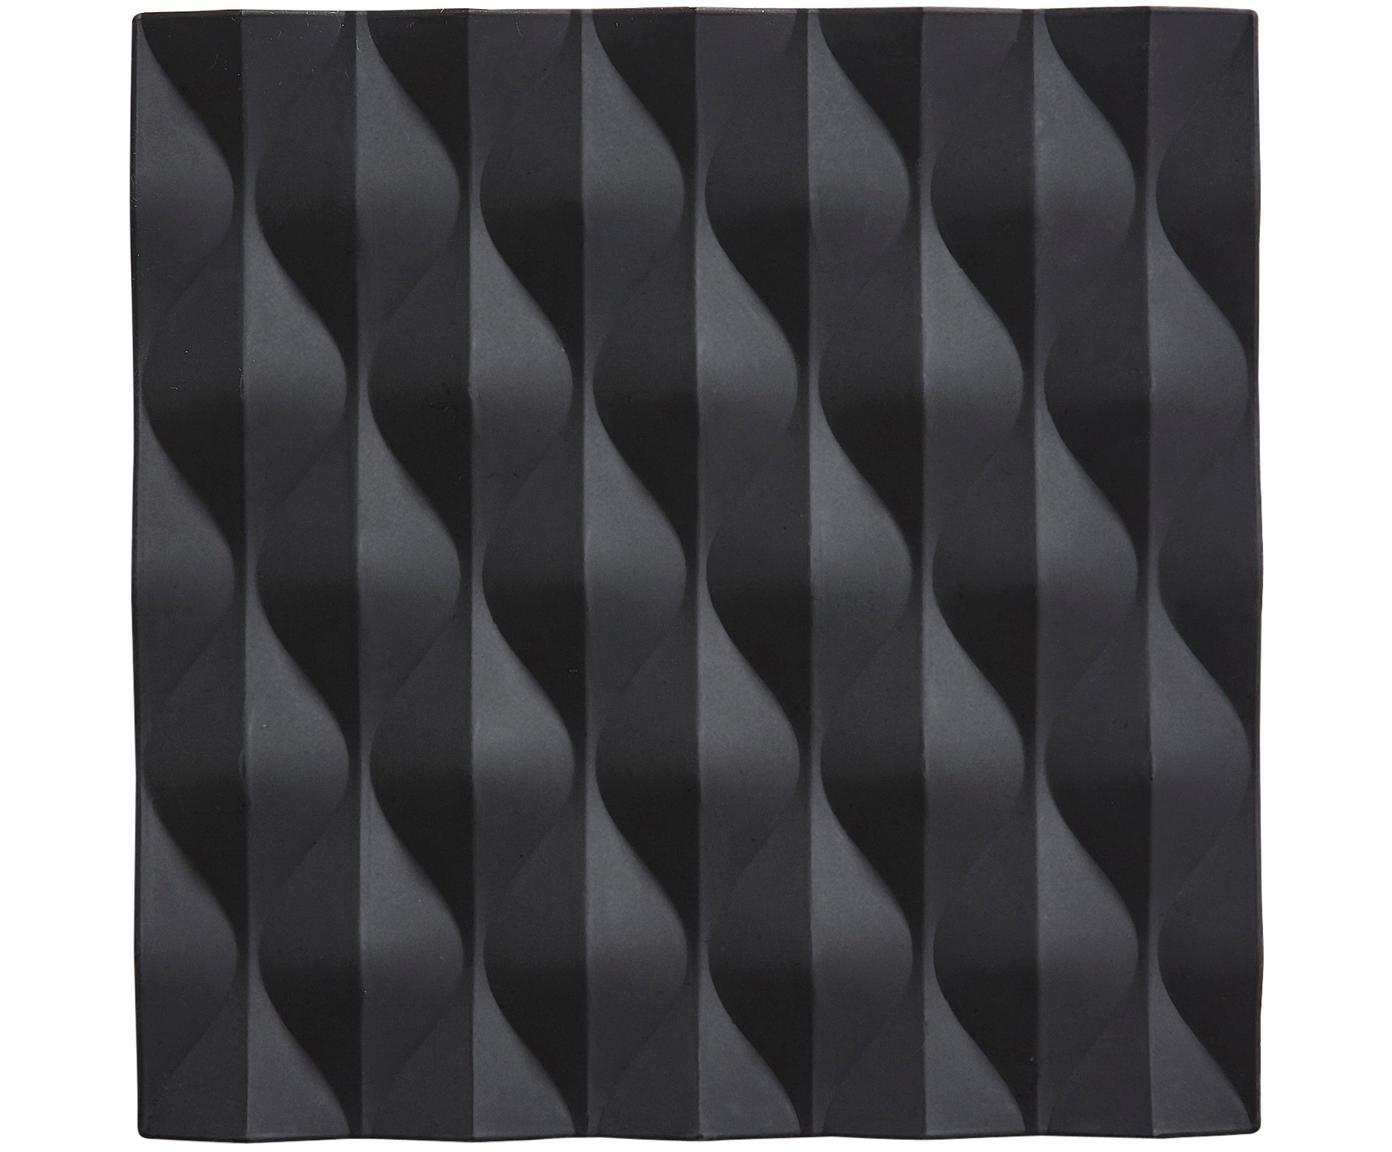 Topfuntersetzer Origami Wave, 2 Stück, Silikon, Schwarz, B 16 x T 16 cm